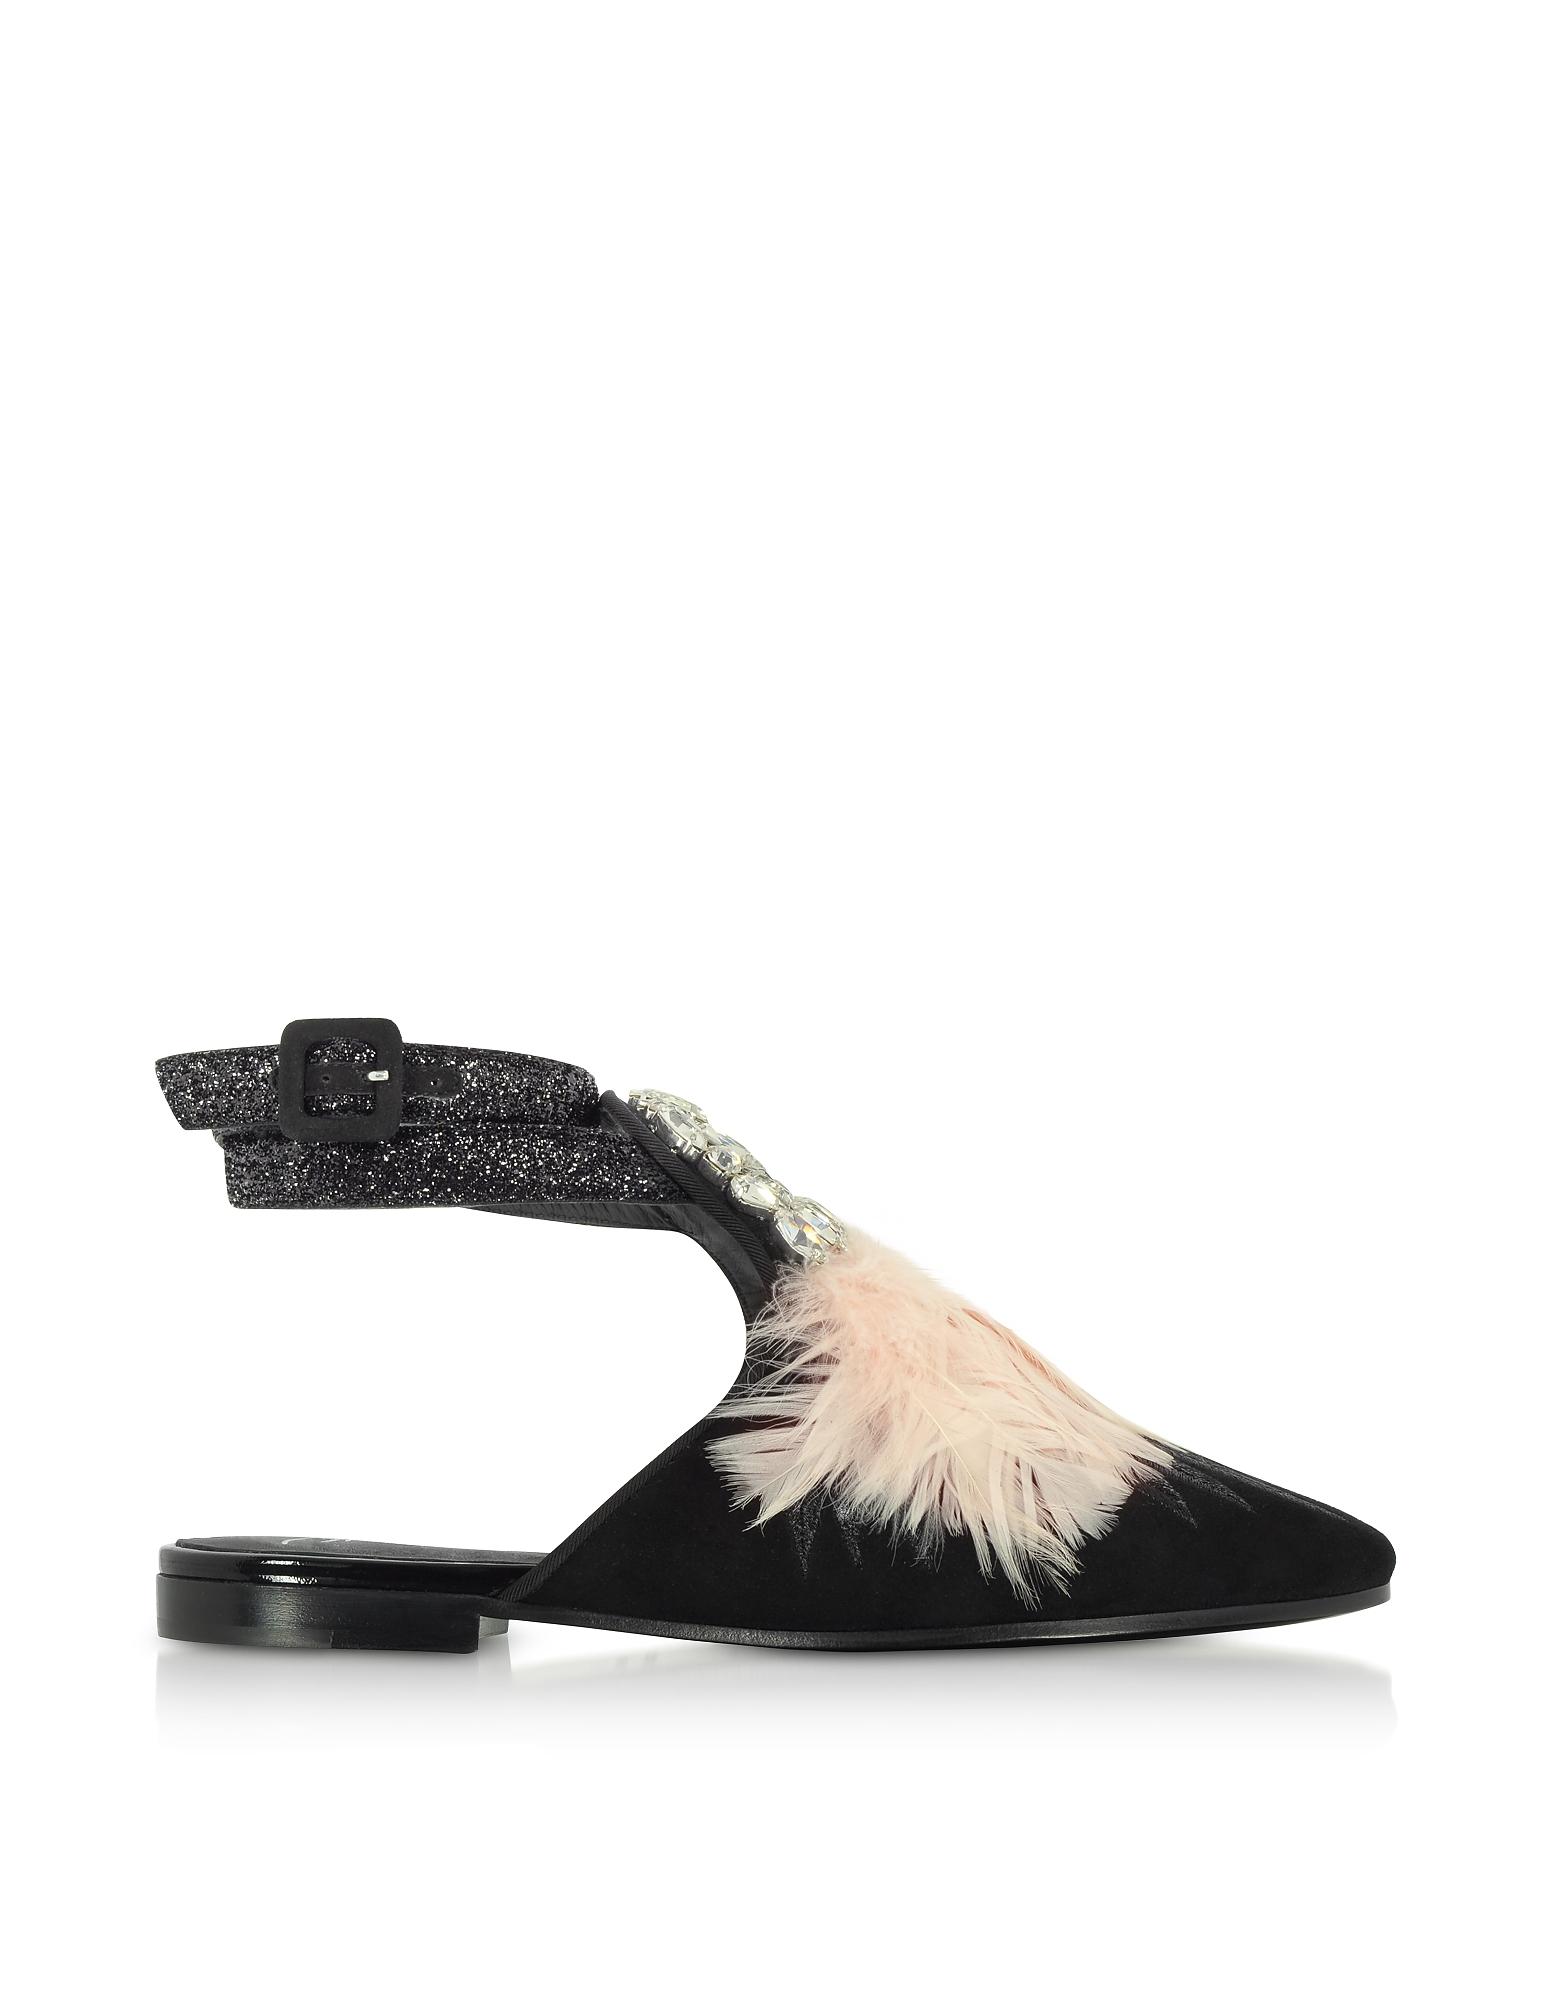 Giuseppe Zanotti Shoes, Letizia Black Suede Mule w/Crystals